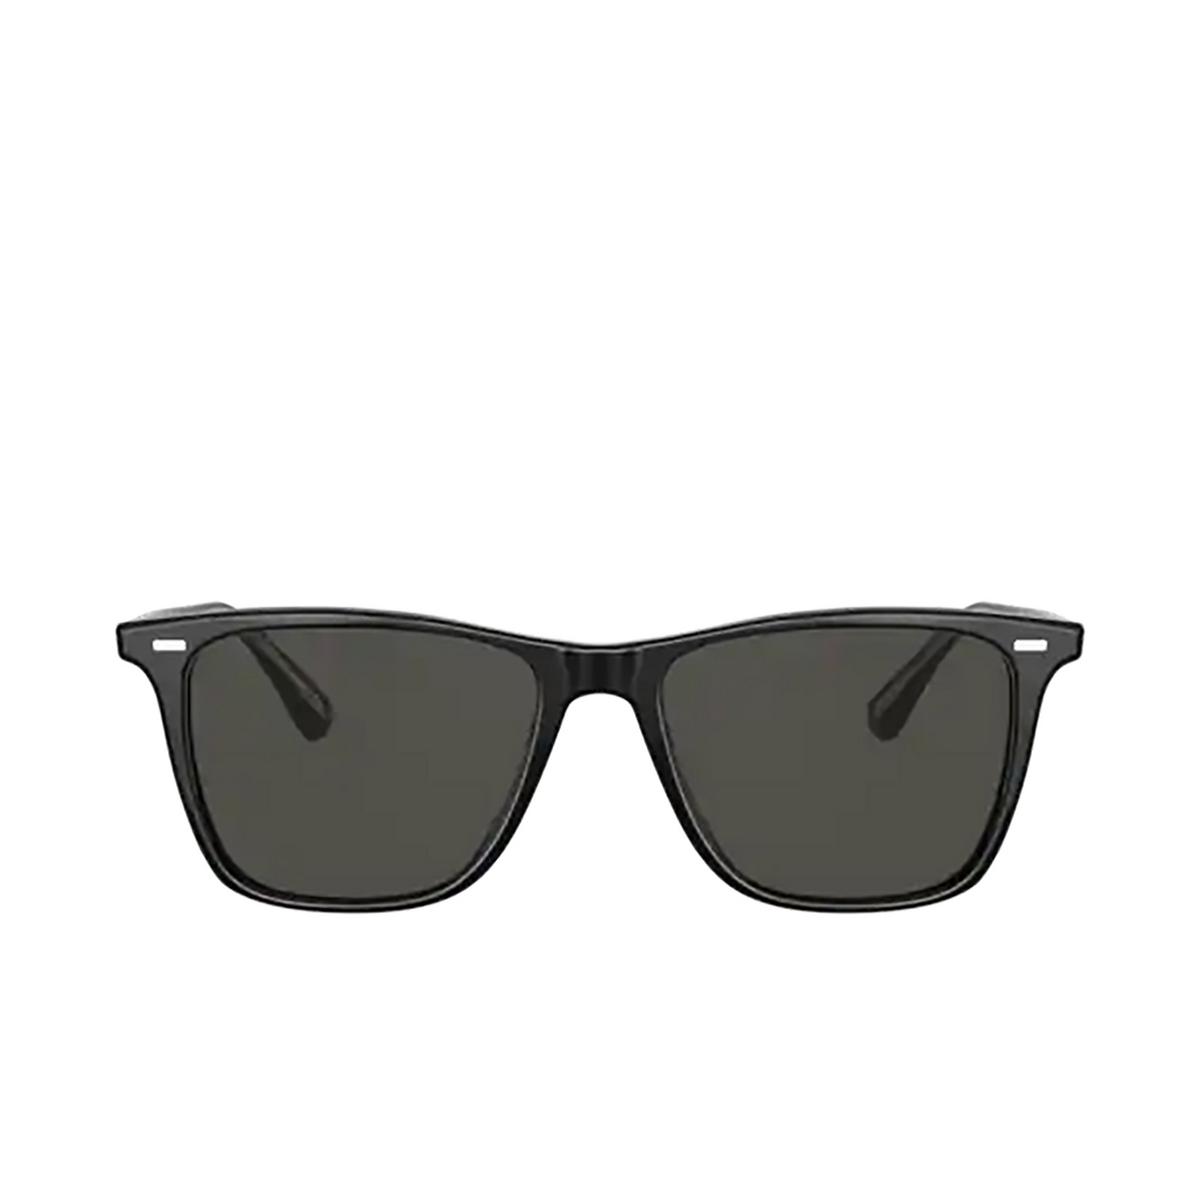 Oliver Peoples® Square Sunglasses: Ollis Sun OV5437SU color Black 1005P2.